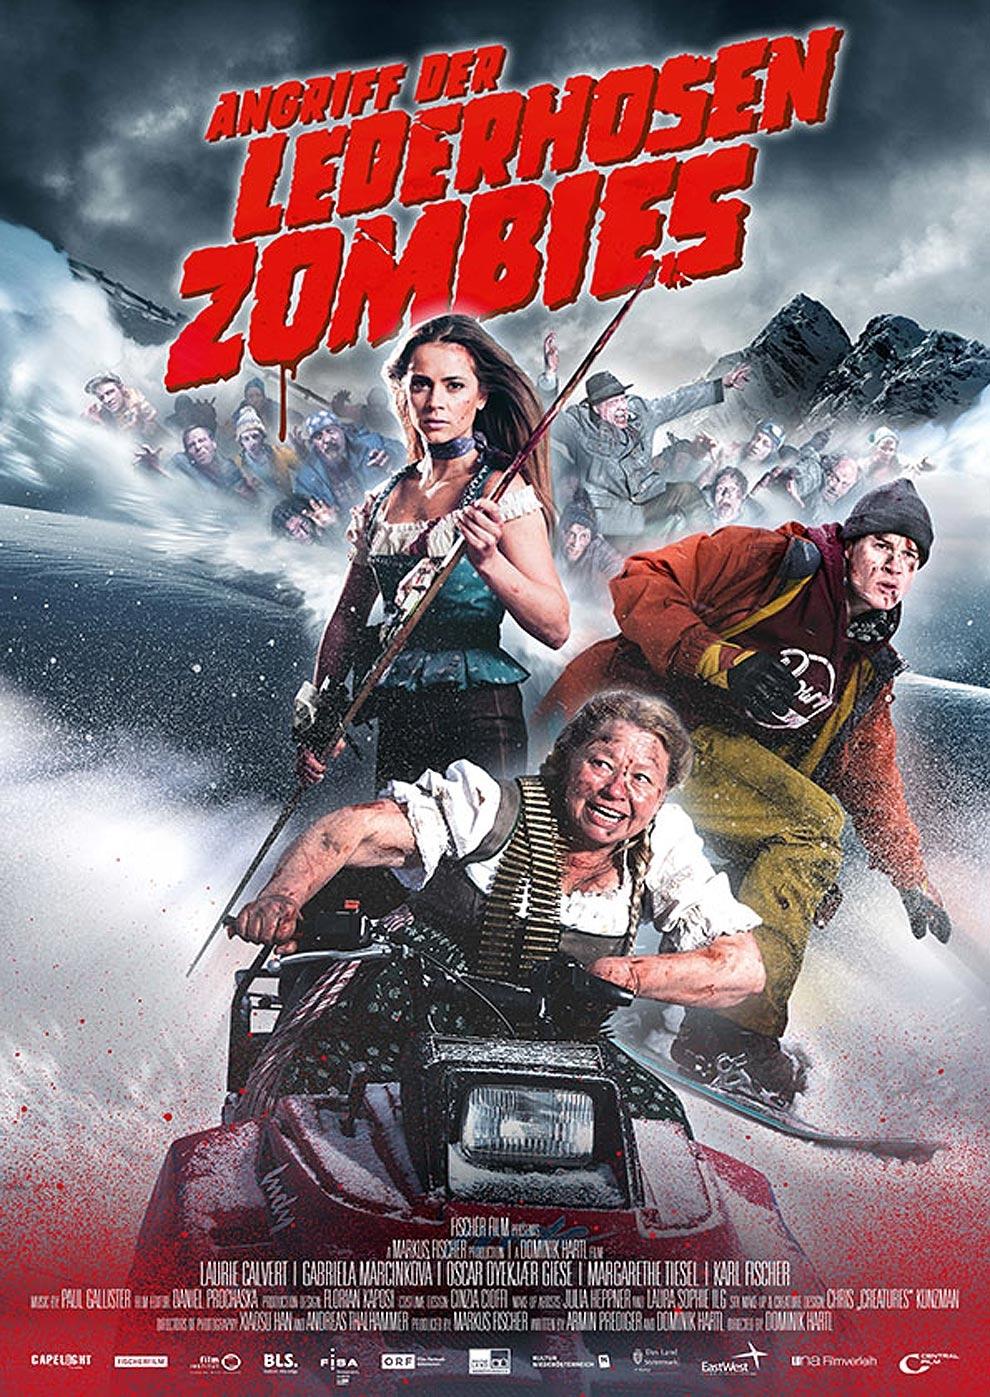 Angriff der Lederhosen Zombies (Poster)